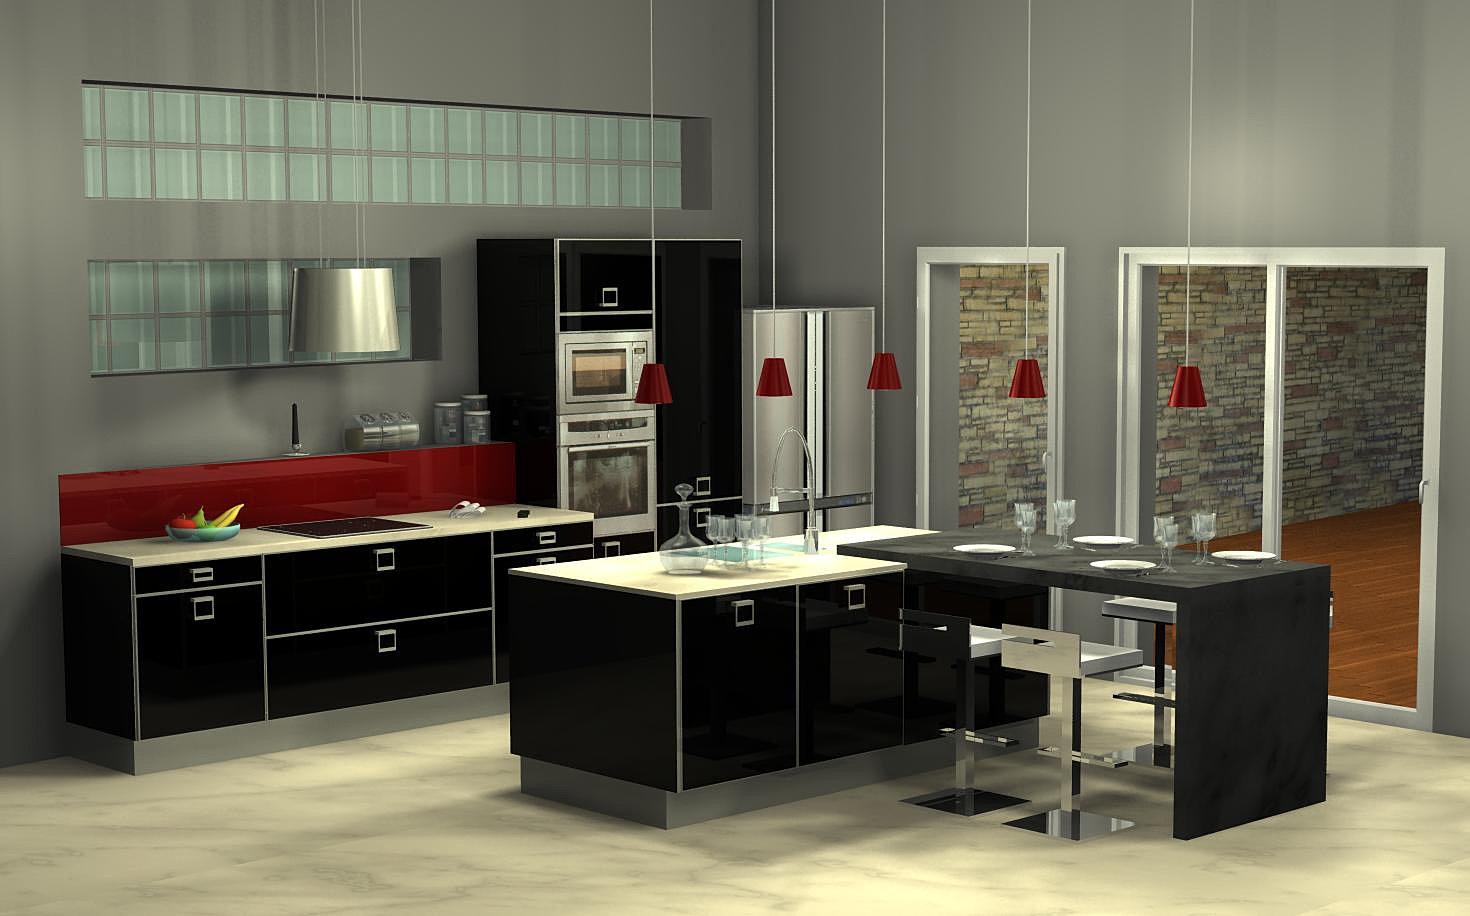 Cuisines Modernes Estrie : menuisart cuisine moderne, cuisine design dressing Vichy  cuisine